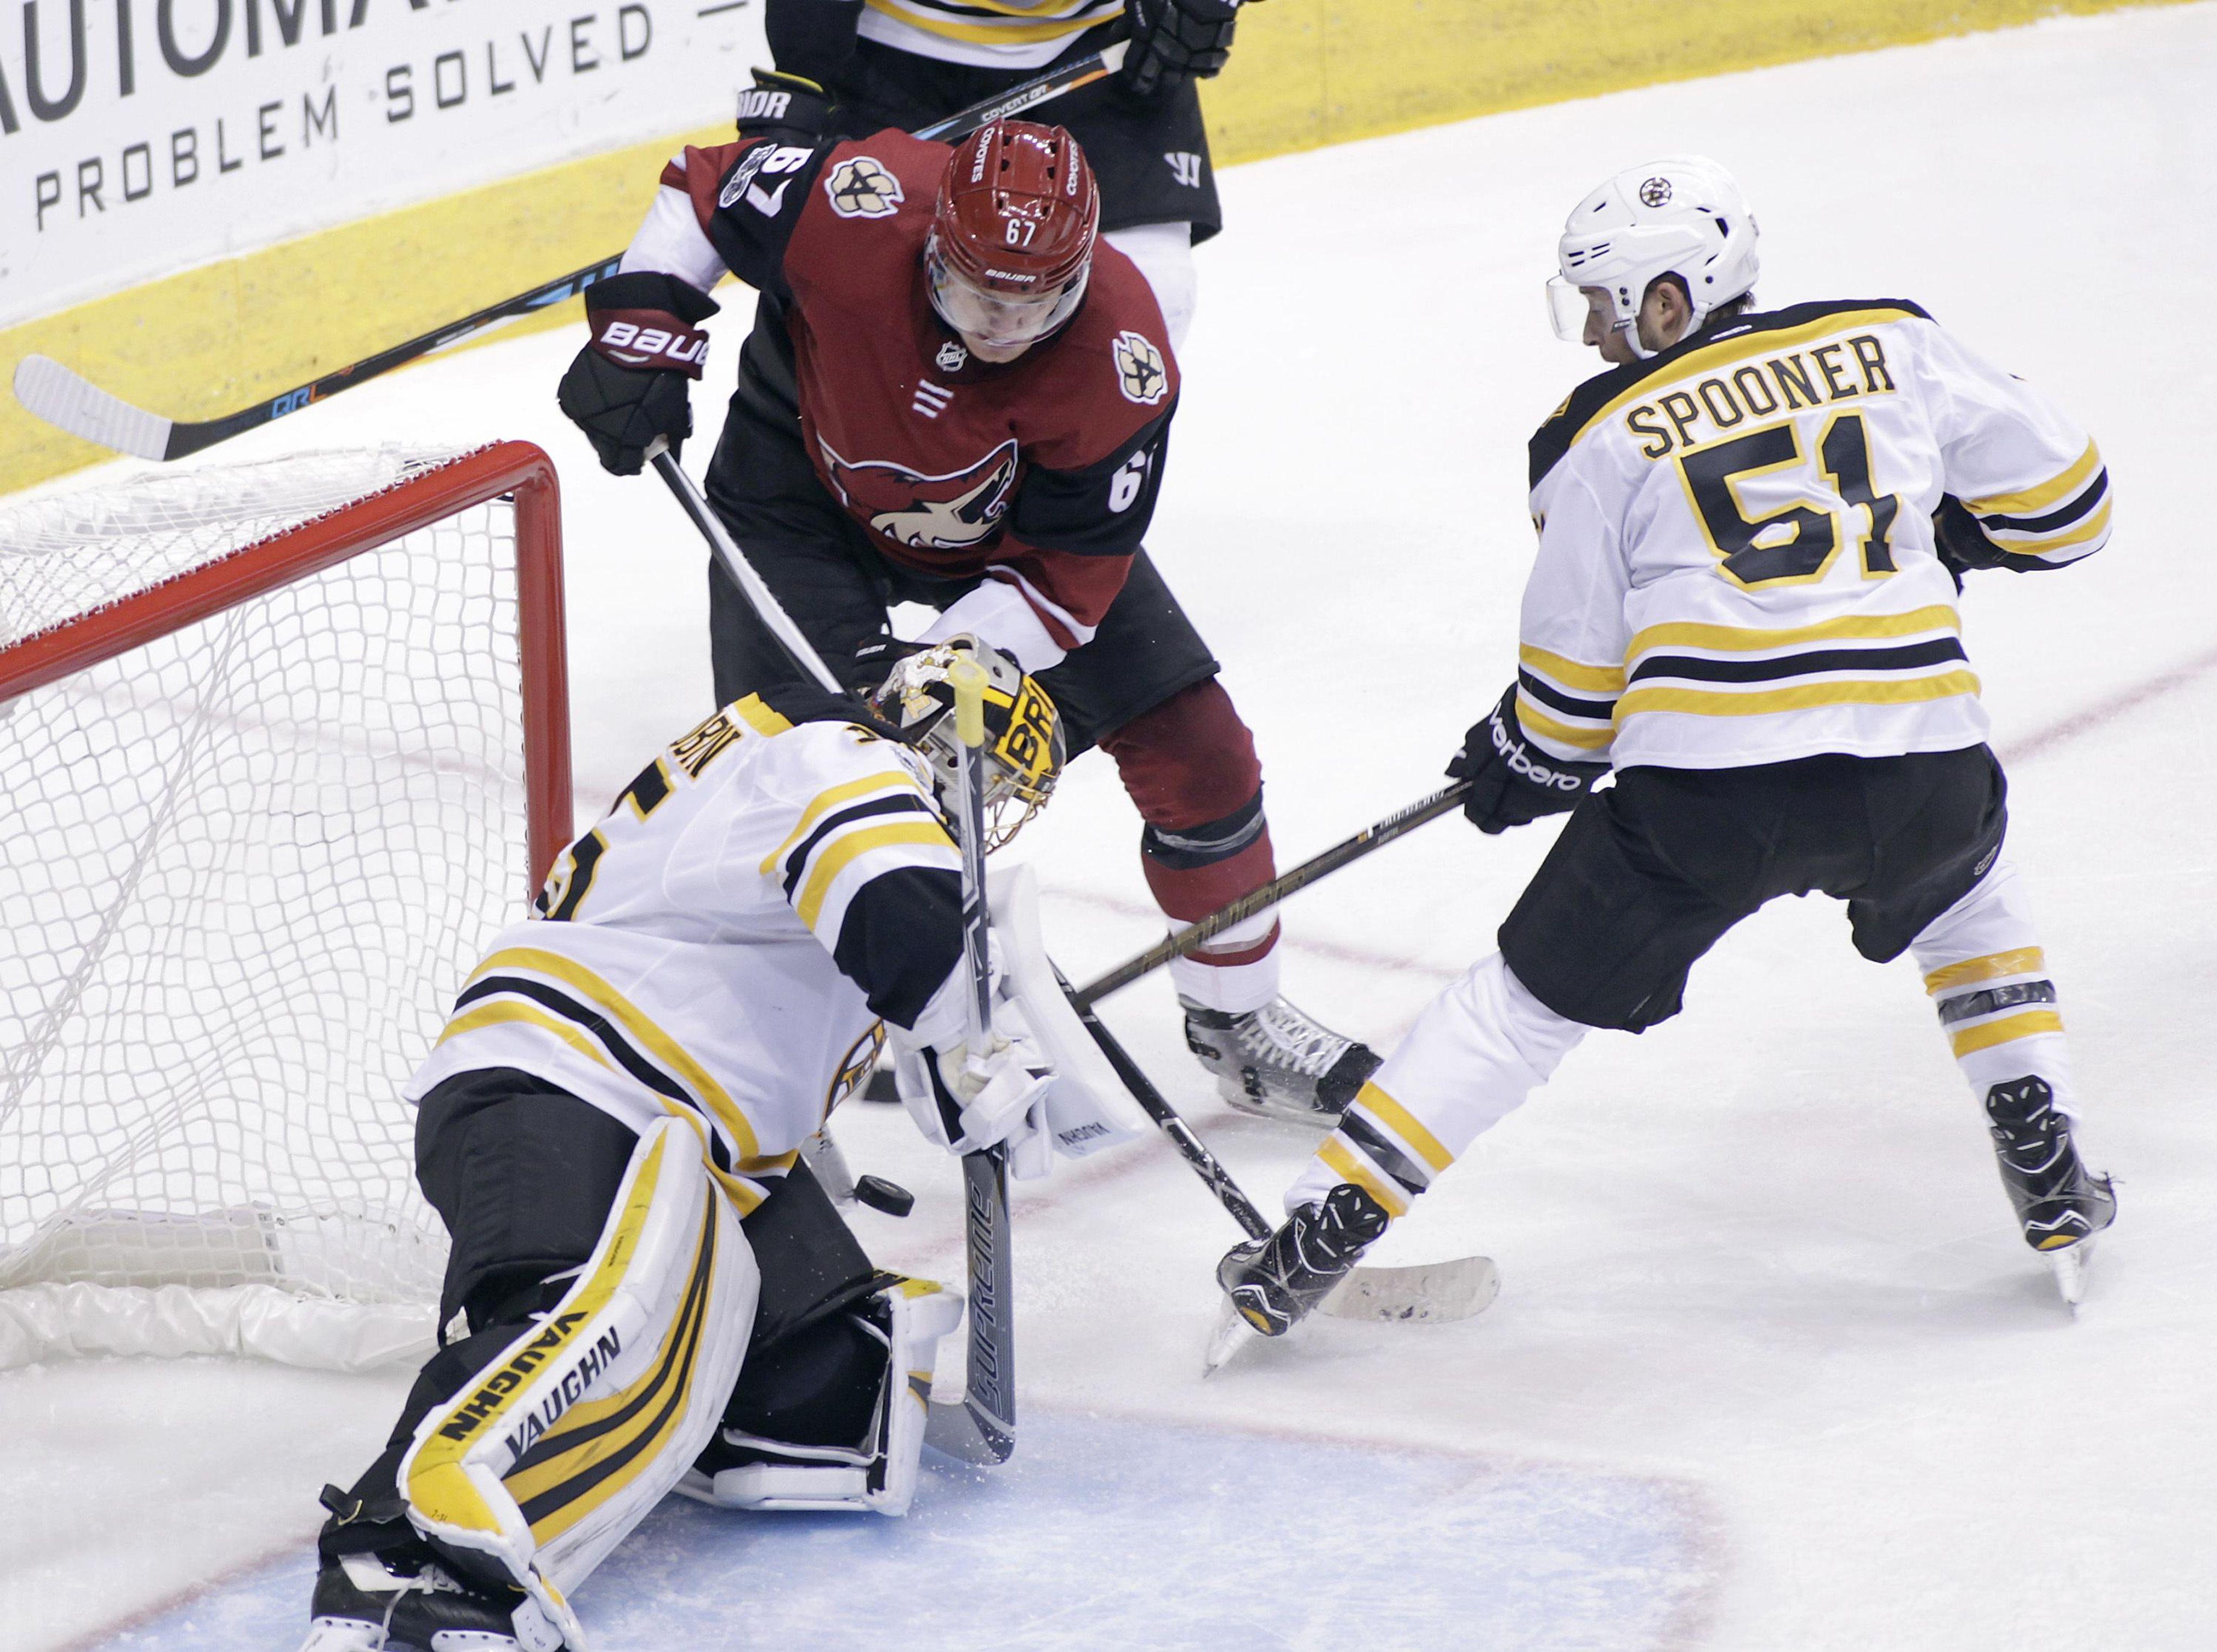 Bruins_coyotes_hockey_00695_s4096x3052